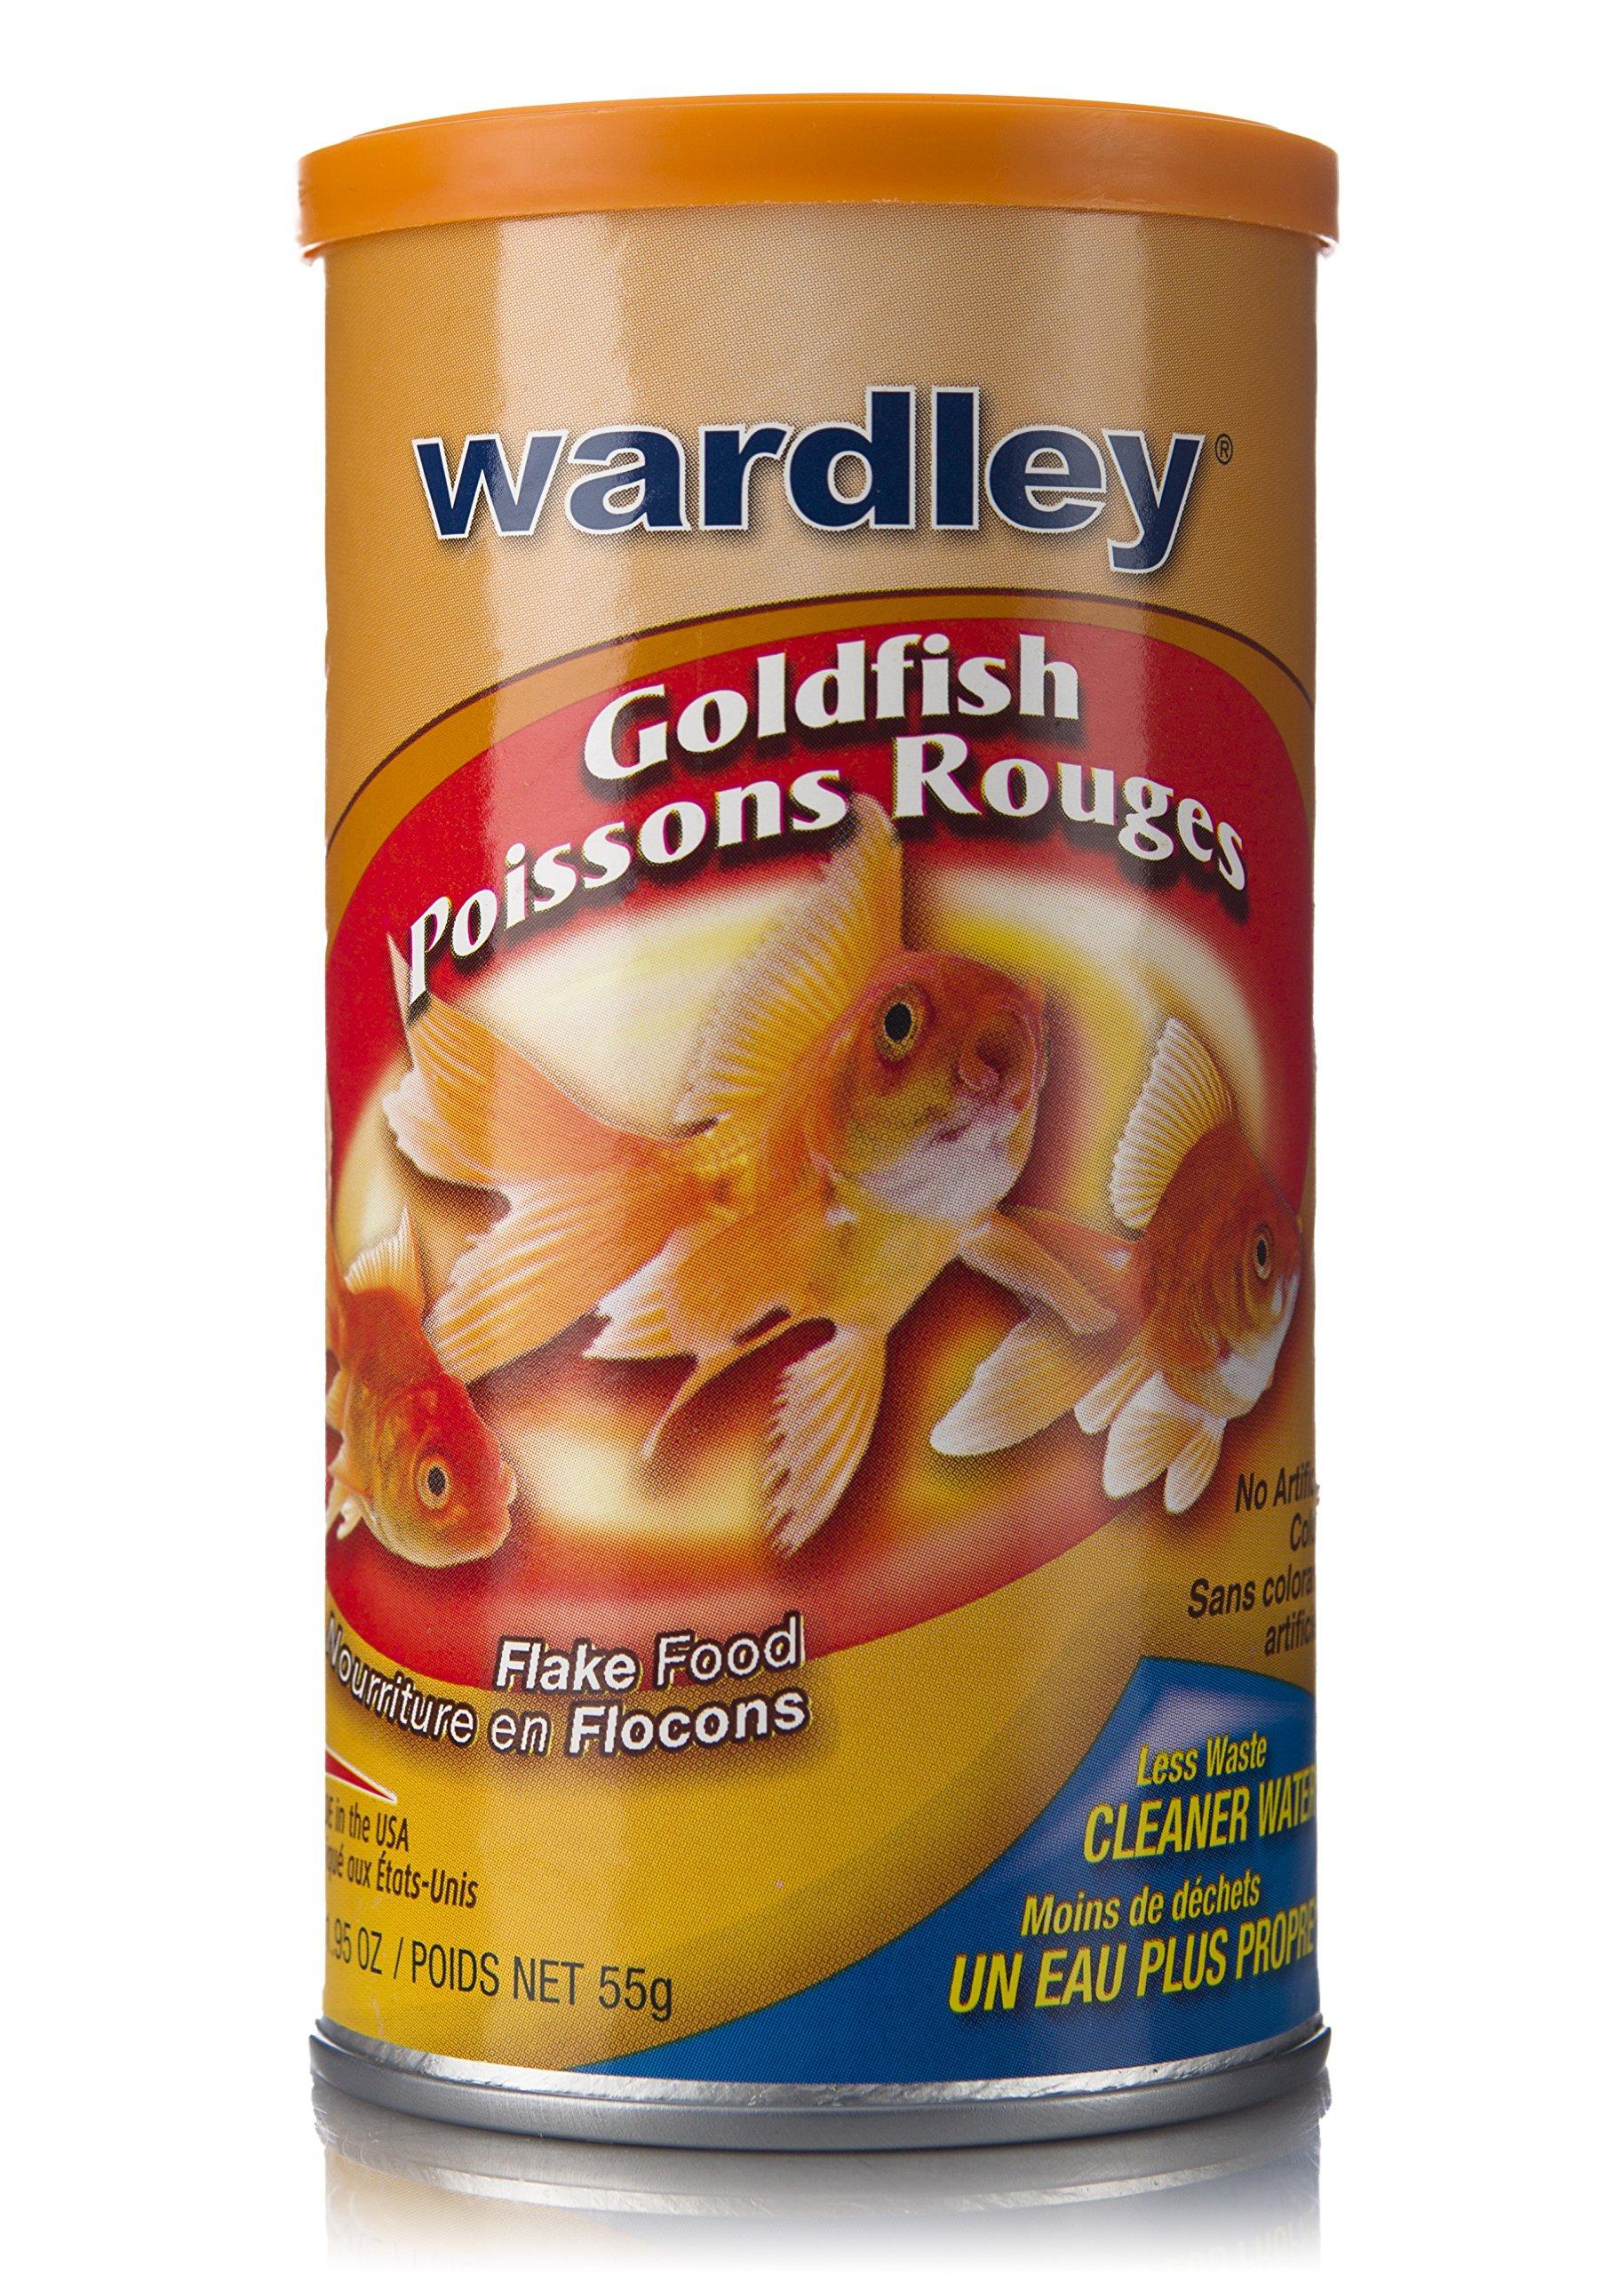 Wardley Premium Goldfish Food Flakes - 1.95oz